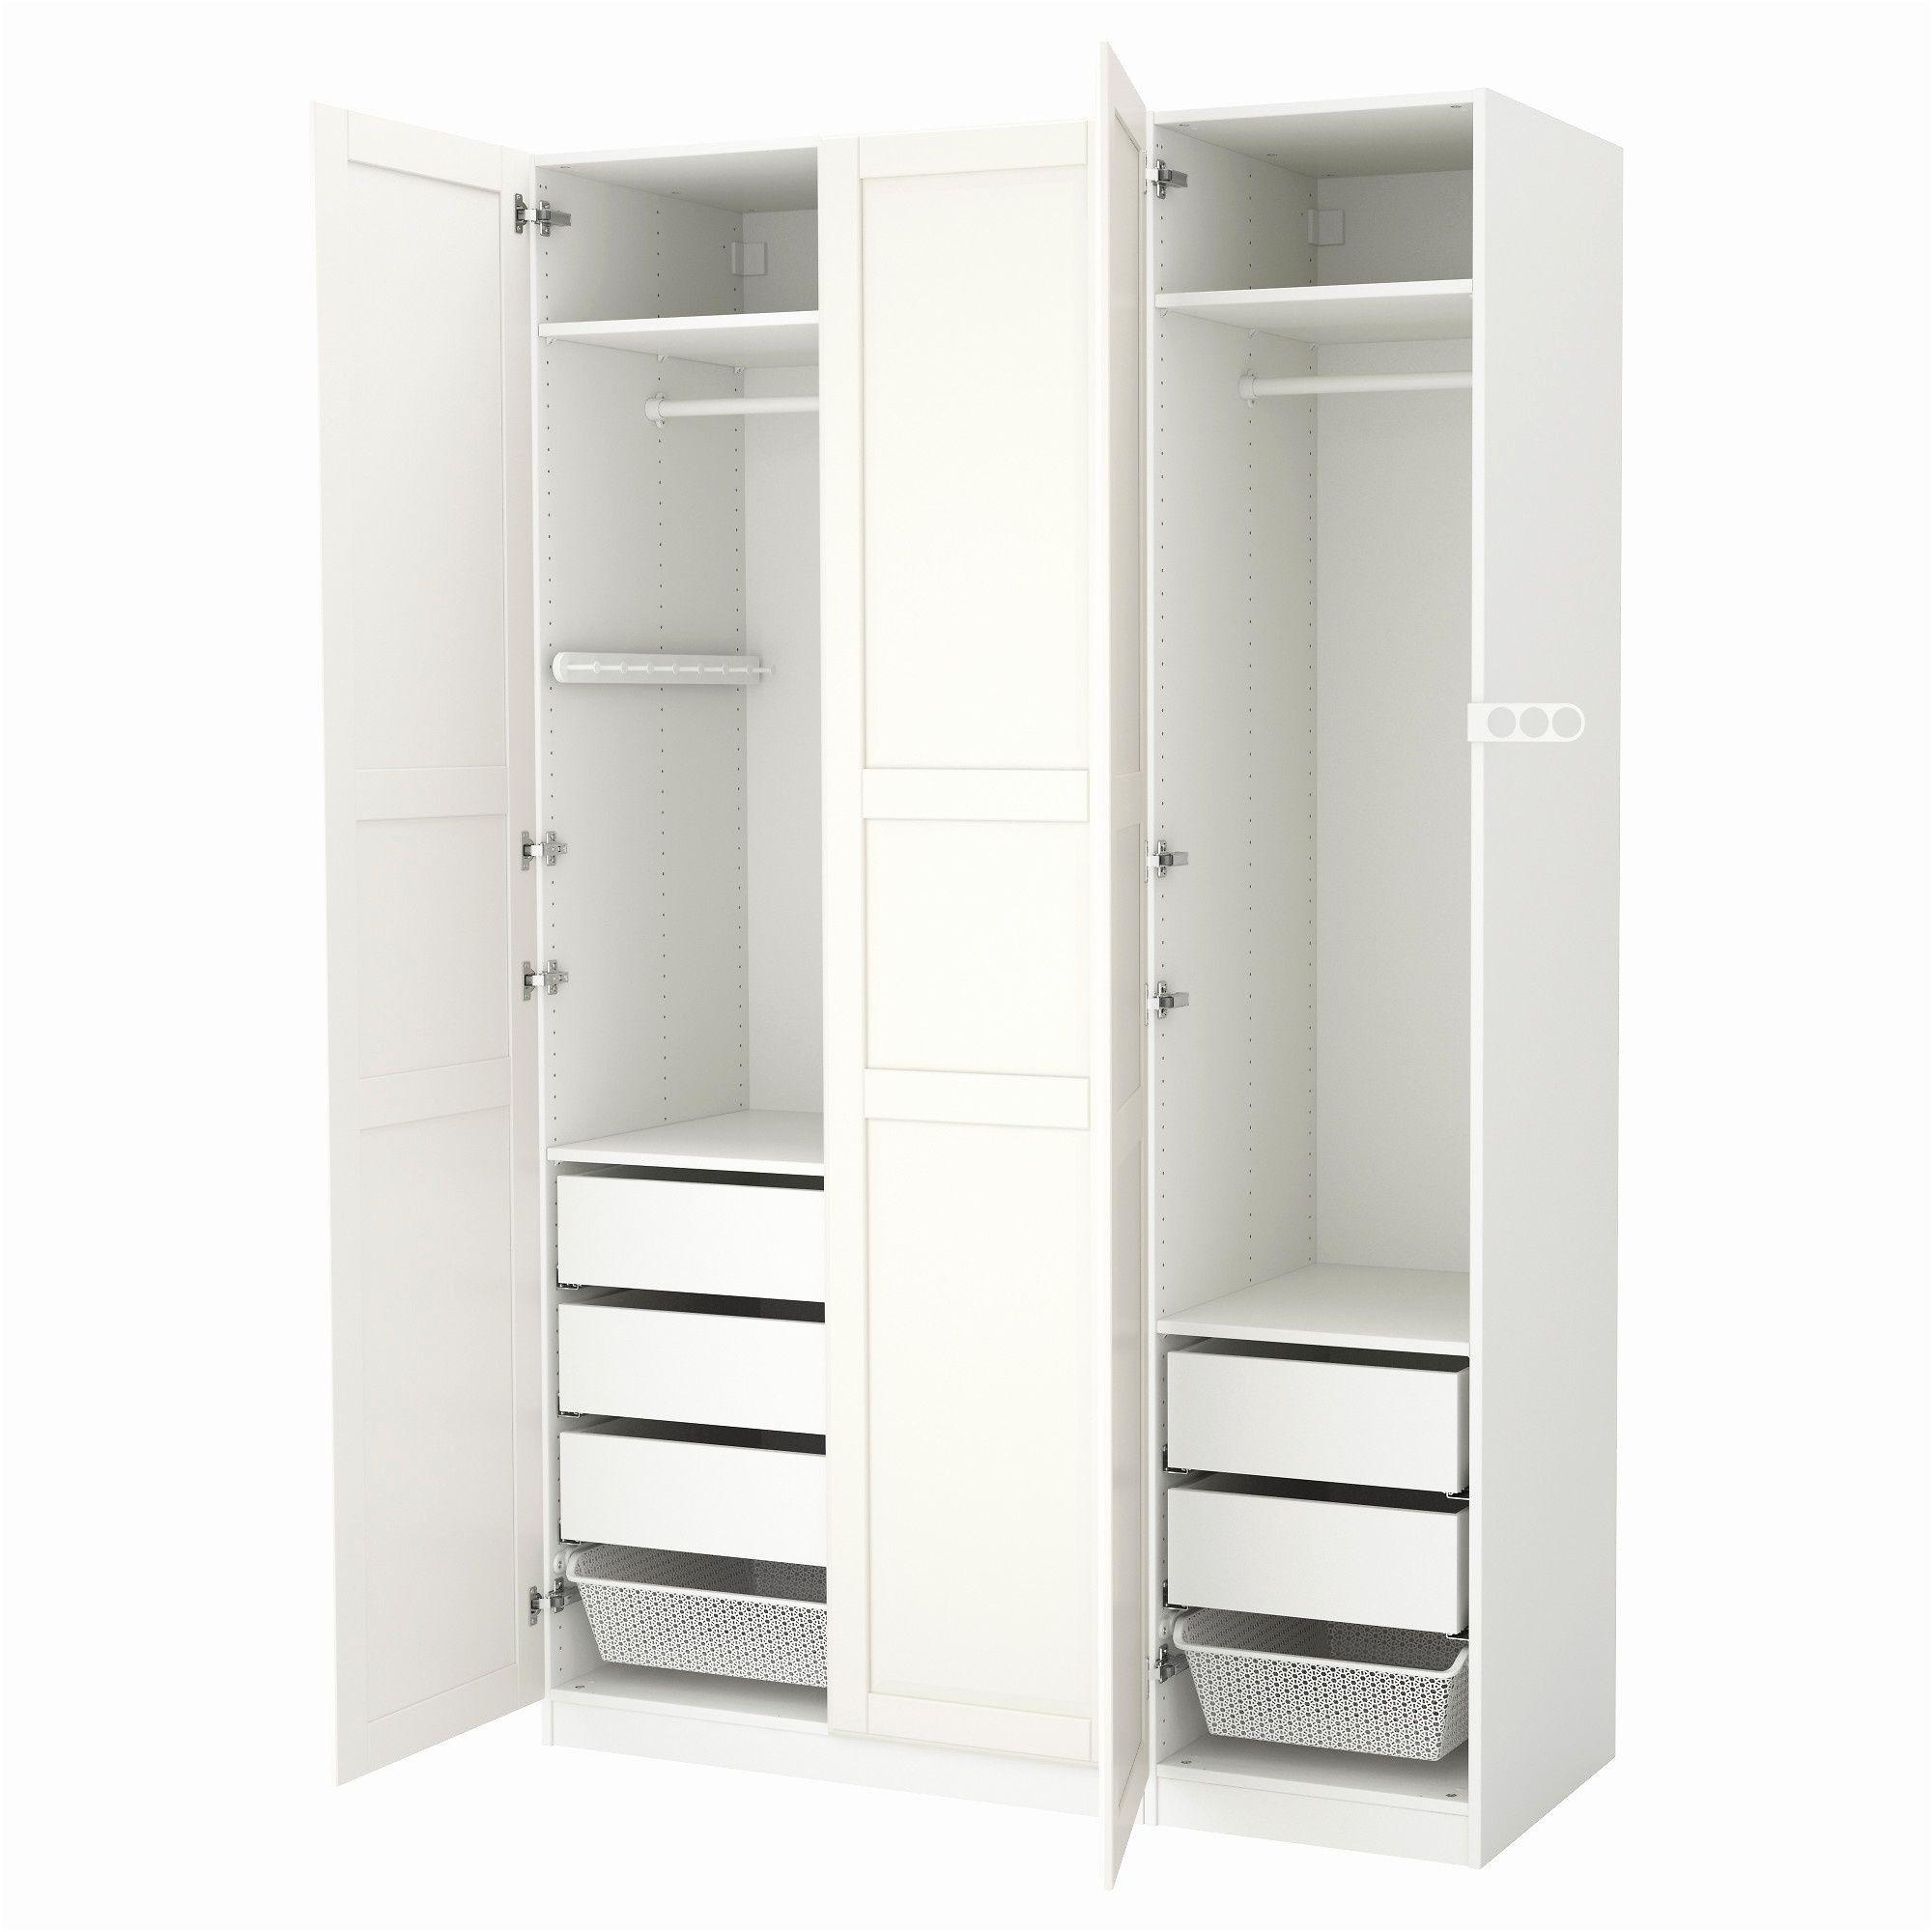 13 Minimaliste Caisson D Angle Ikea